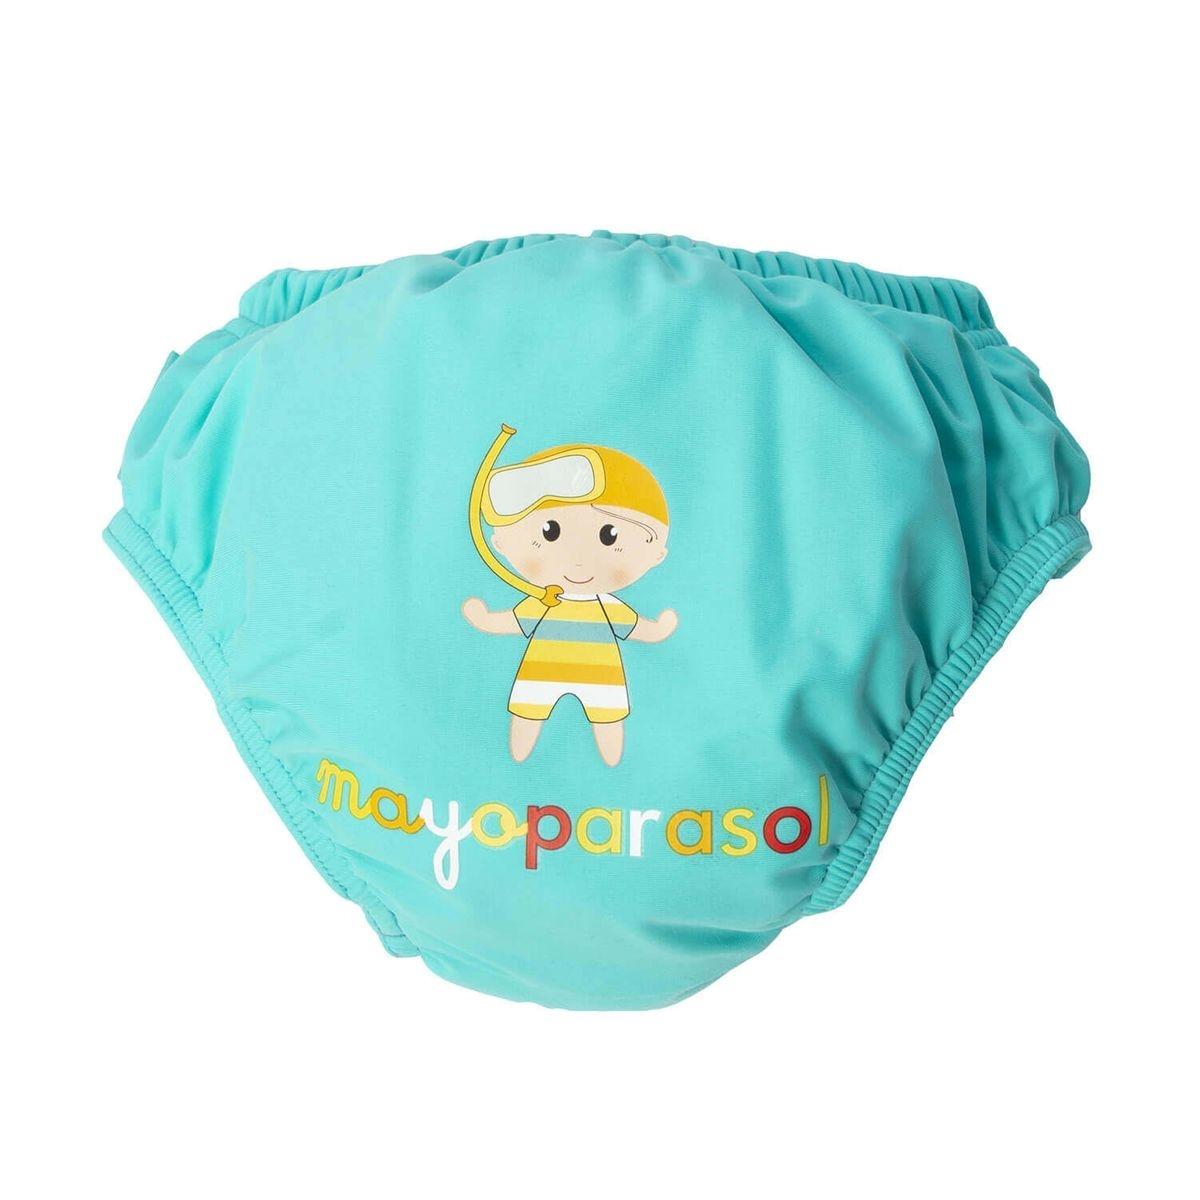 Caraïbi   maillot de bain bébé couche piscine garçon